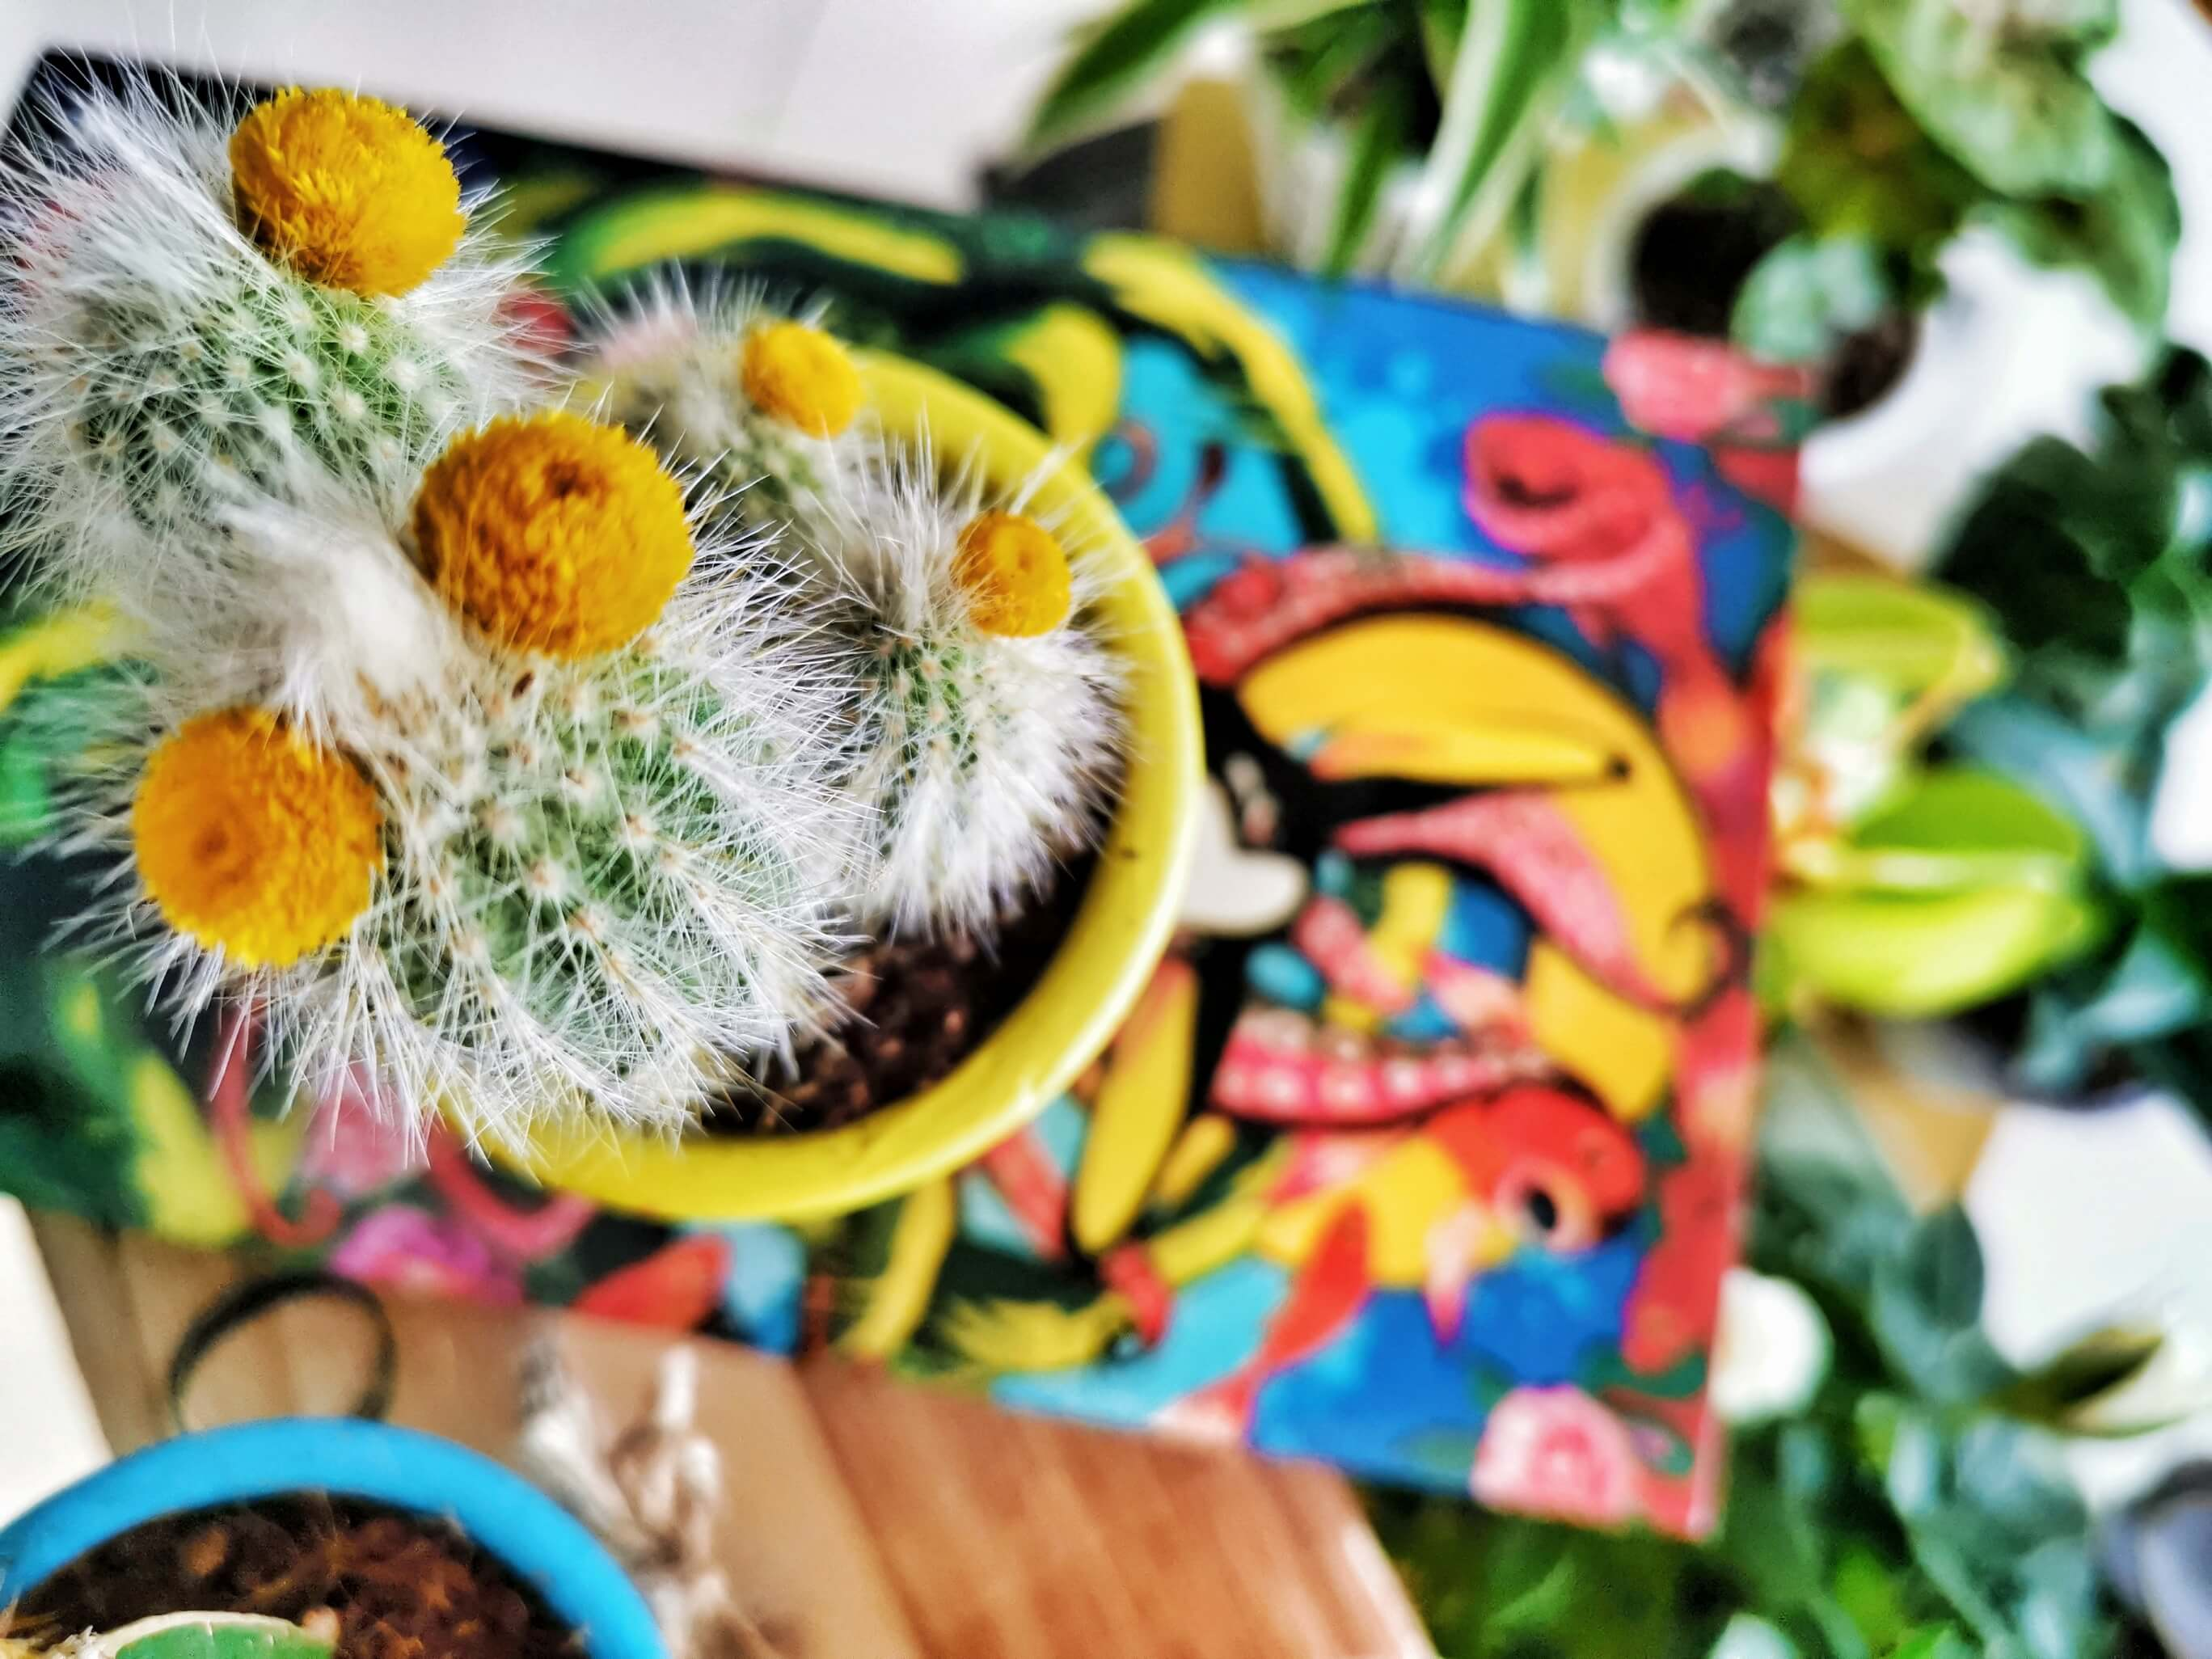 IMG 20190612 131901 01 resized 20190616 084245370 - Kreatives Recycling: Blumentöpfe in 5 verschiedenen Stilen